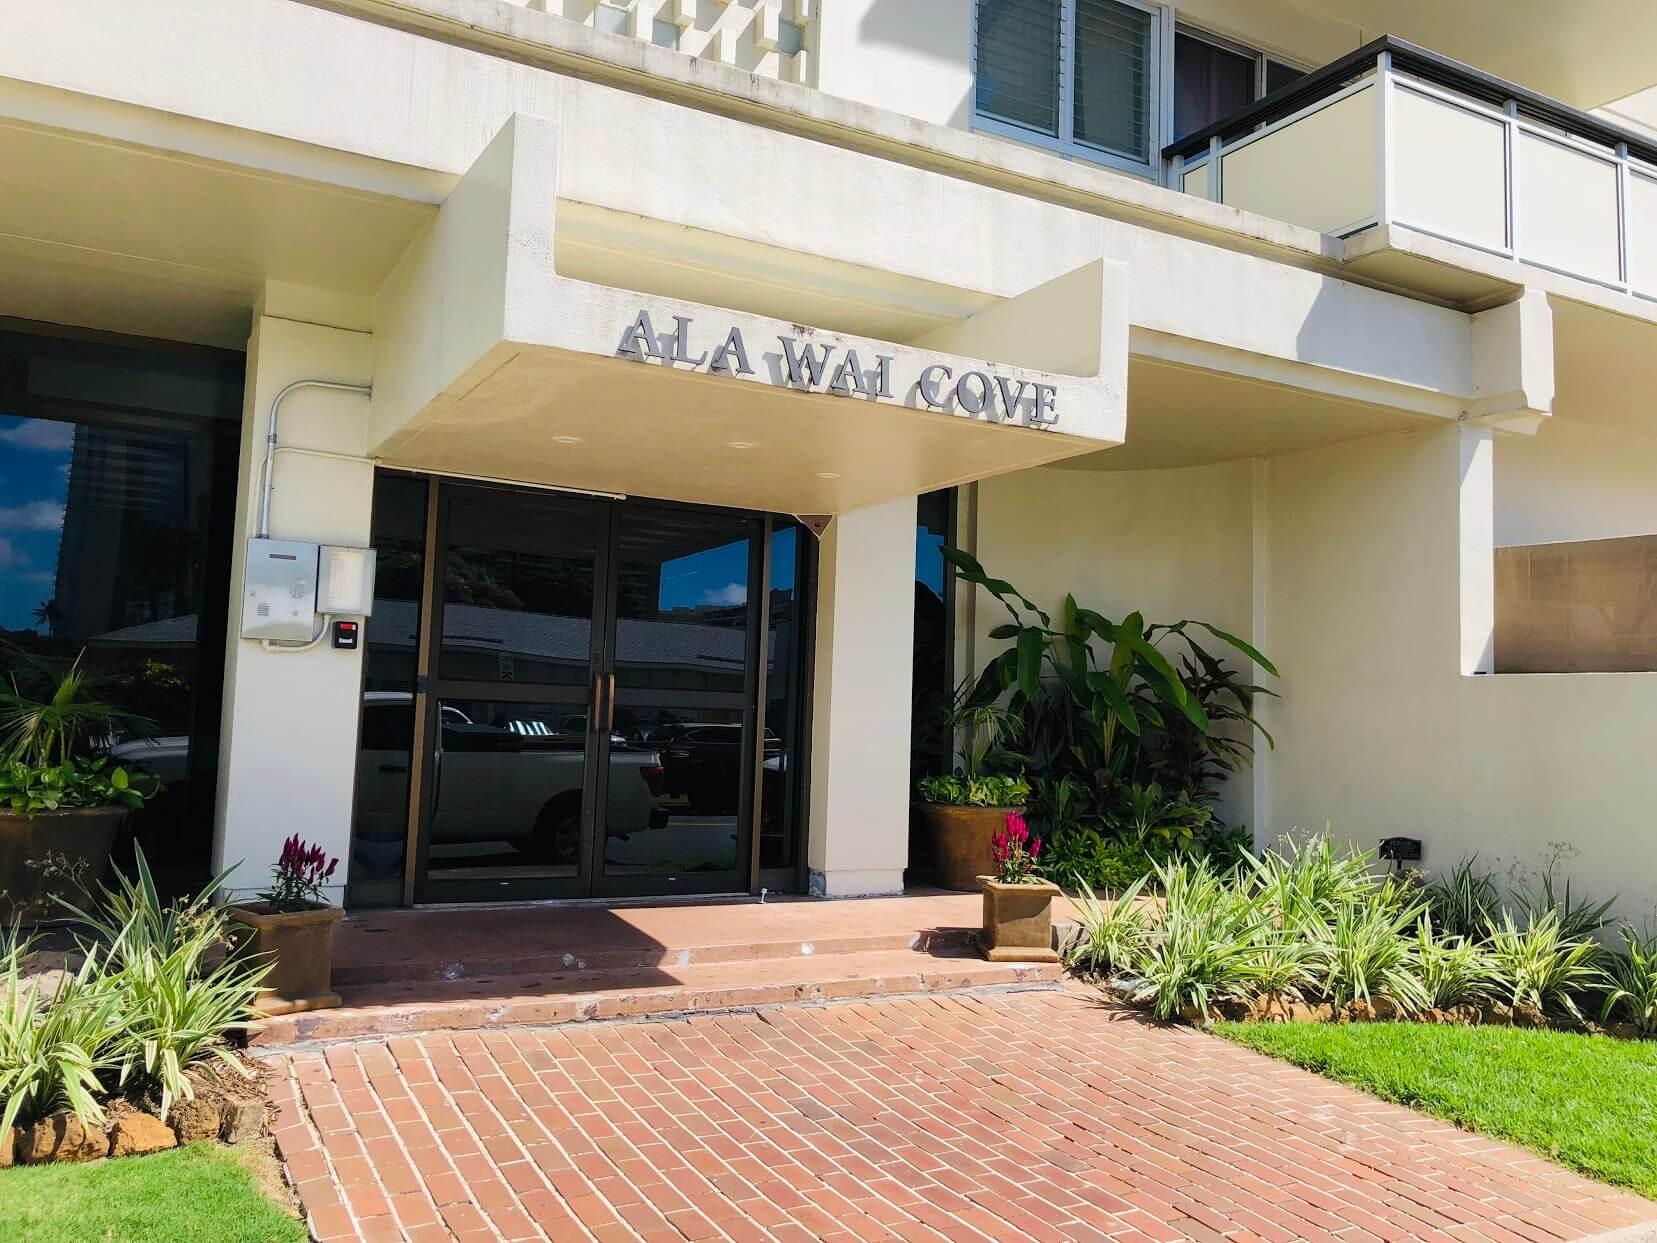 Ala Wai Coveのエントランス